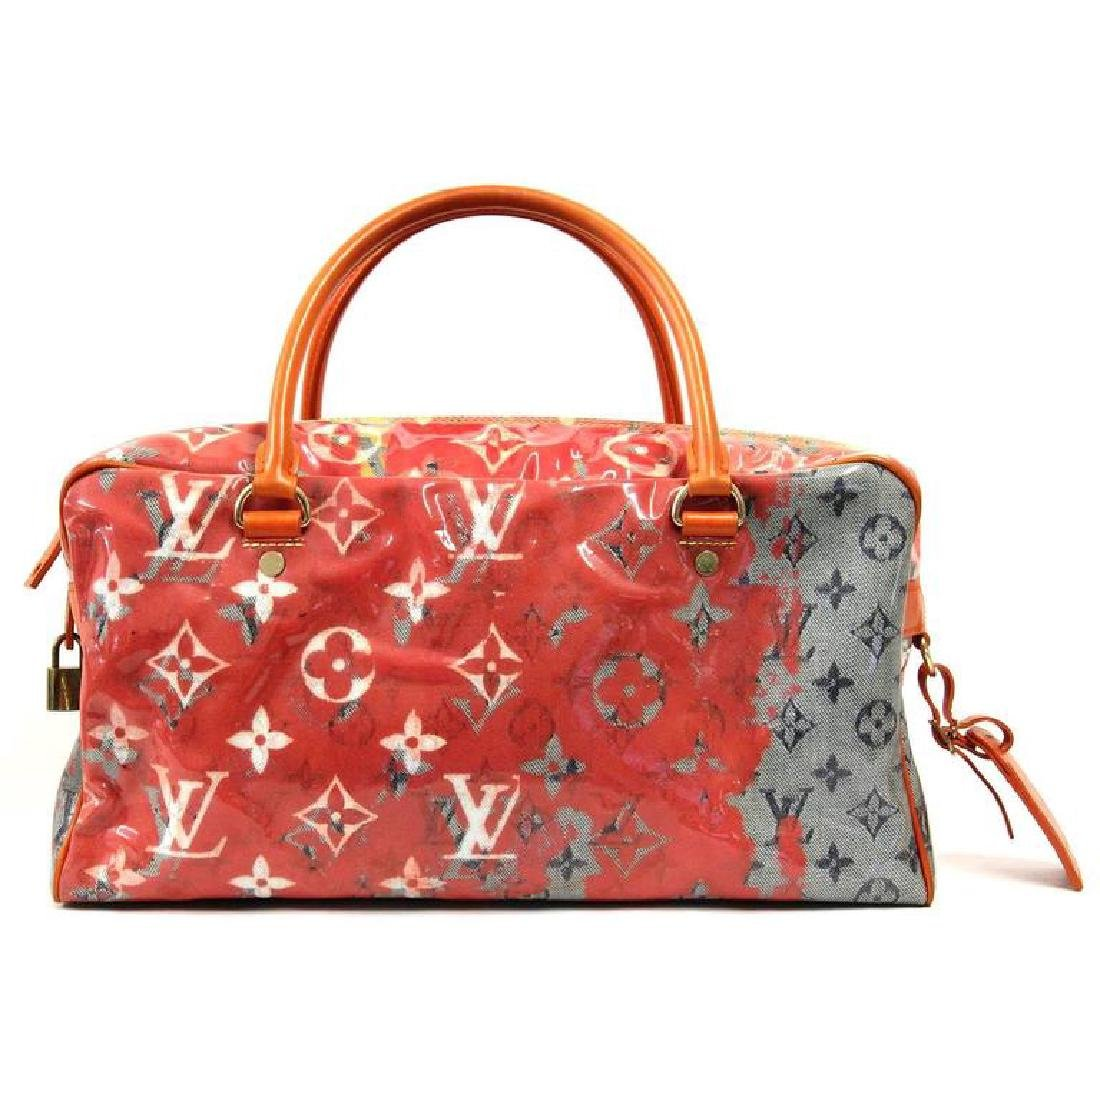 2008 Louis Vuitton Orange Special Edition Pulp - 2